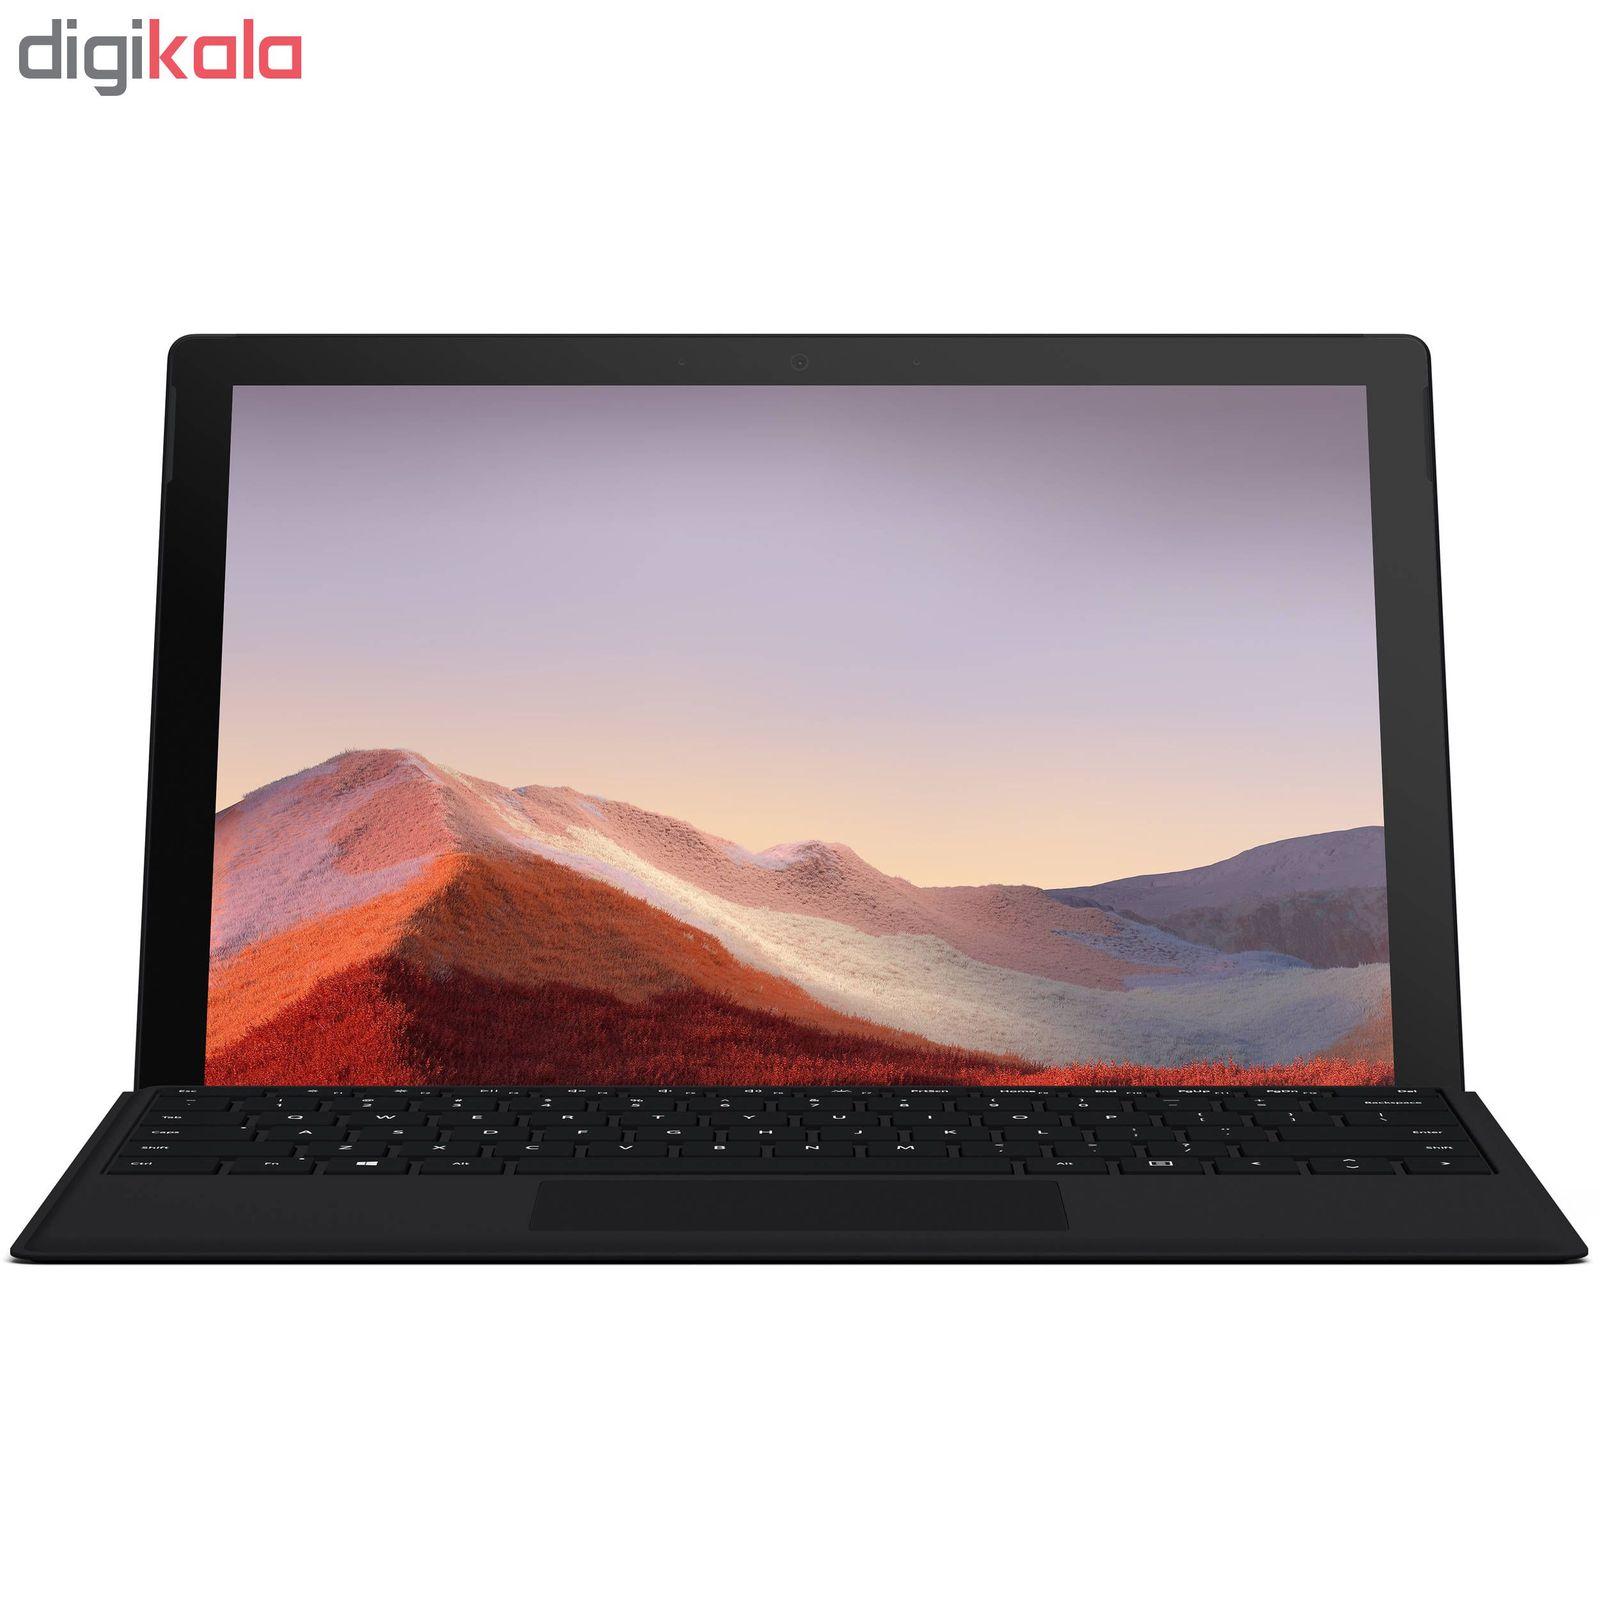 تبلت مایکروسافت مدل Surface Pro 7 - C به همراه کیبورد Black Type Cover main 1 2